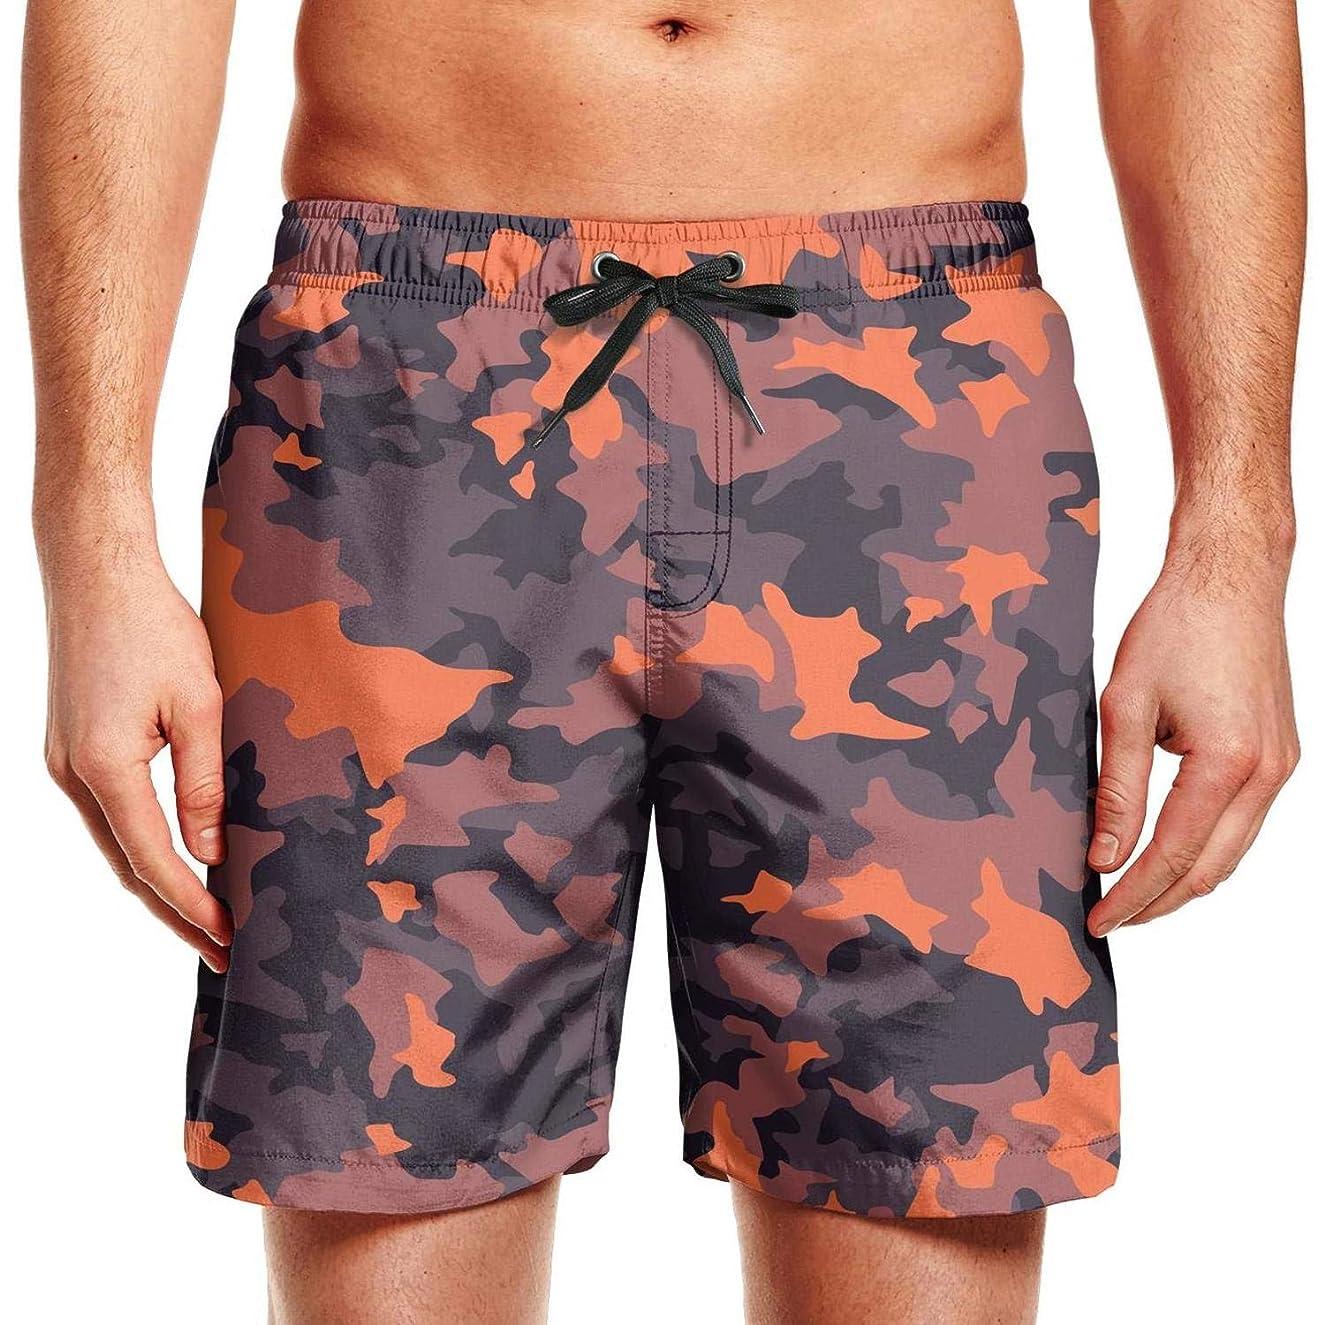 Man Classic Camo Fashion Camouflage Adjustable Waistline Beach Trunks Quick Dry Swim Trunks